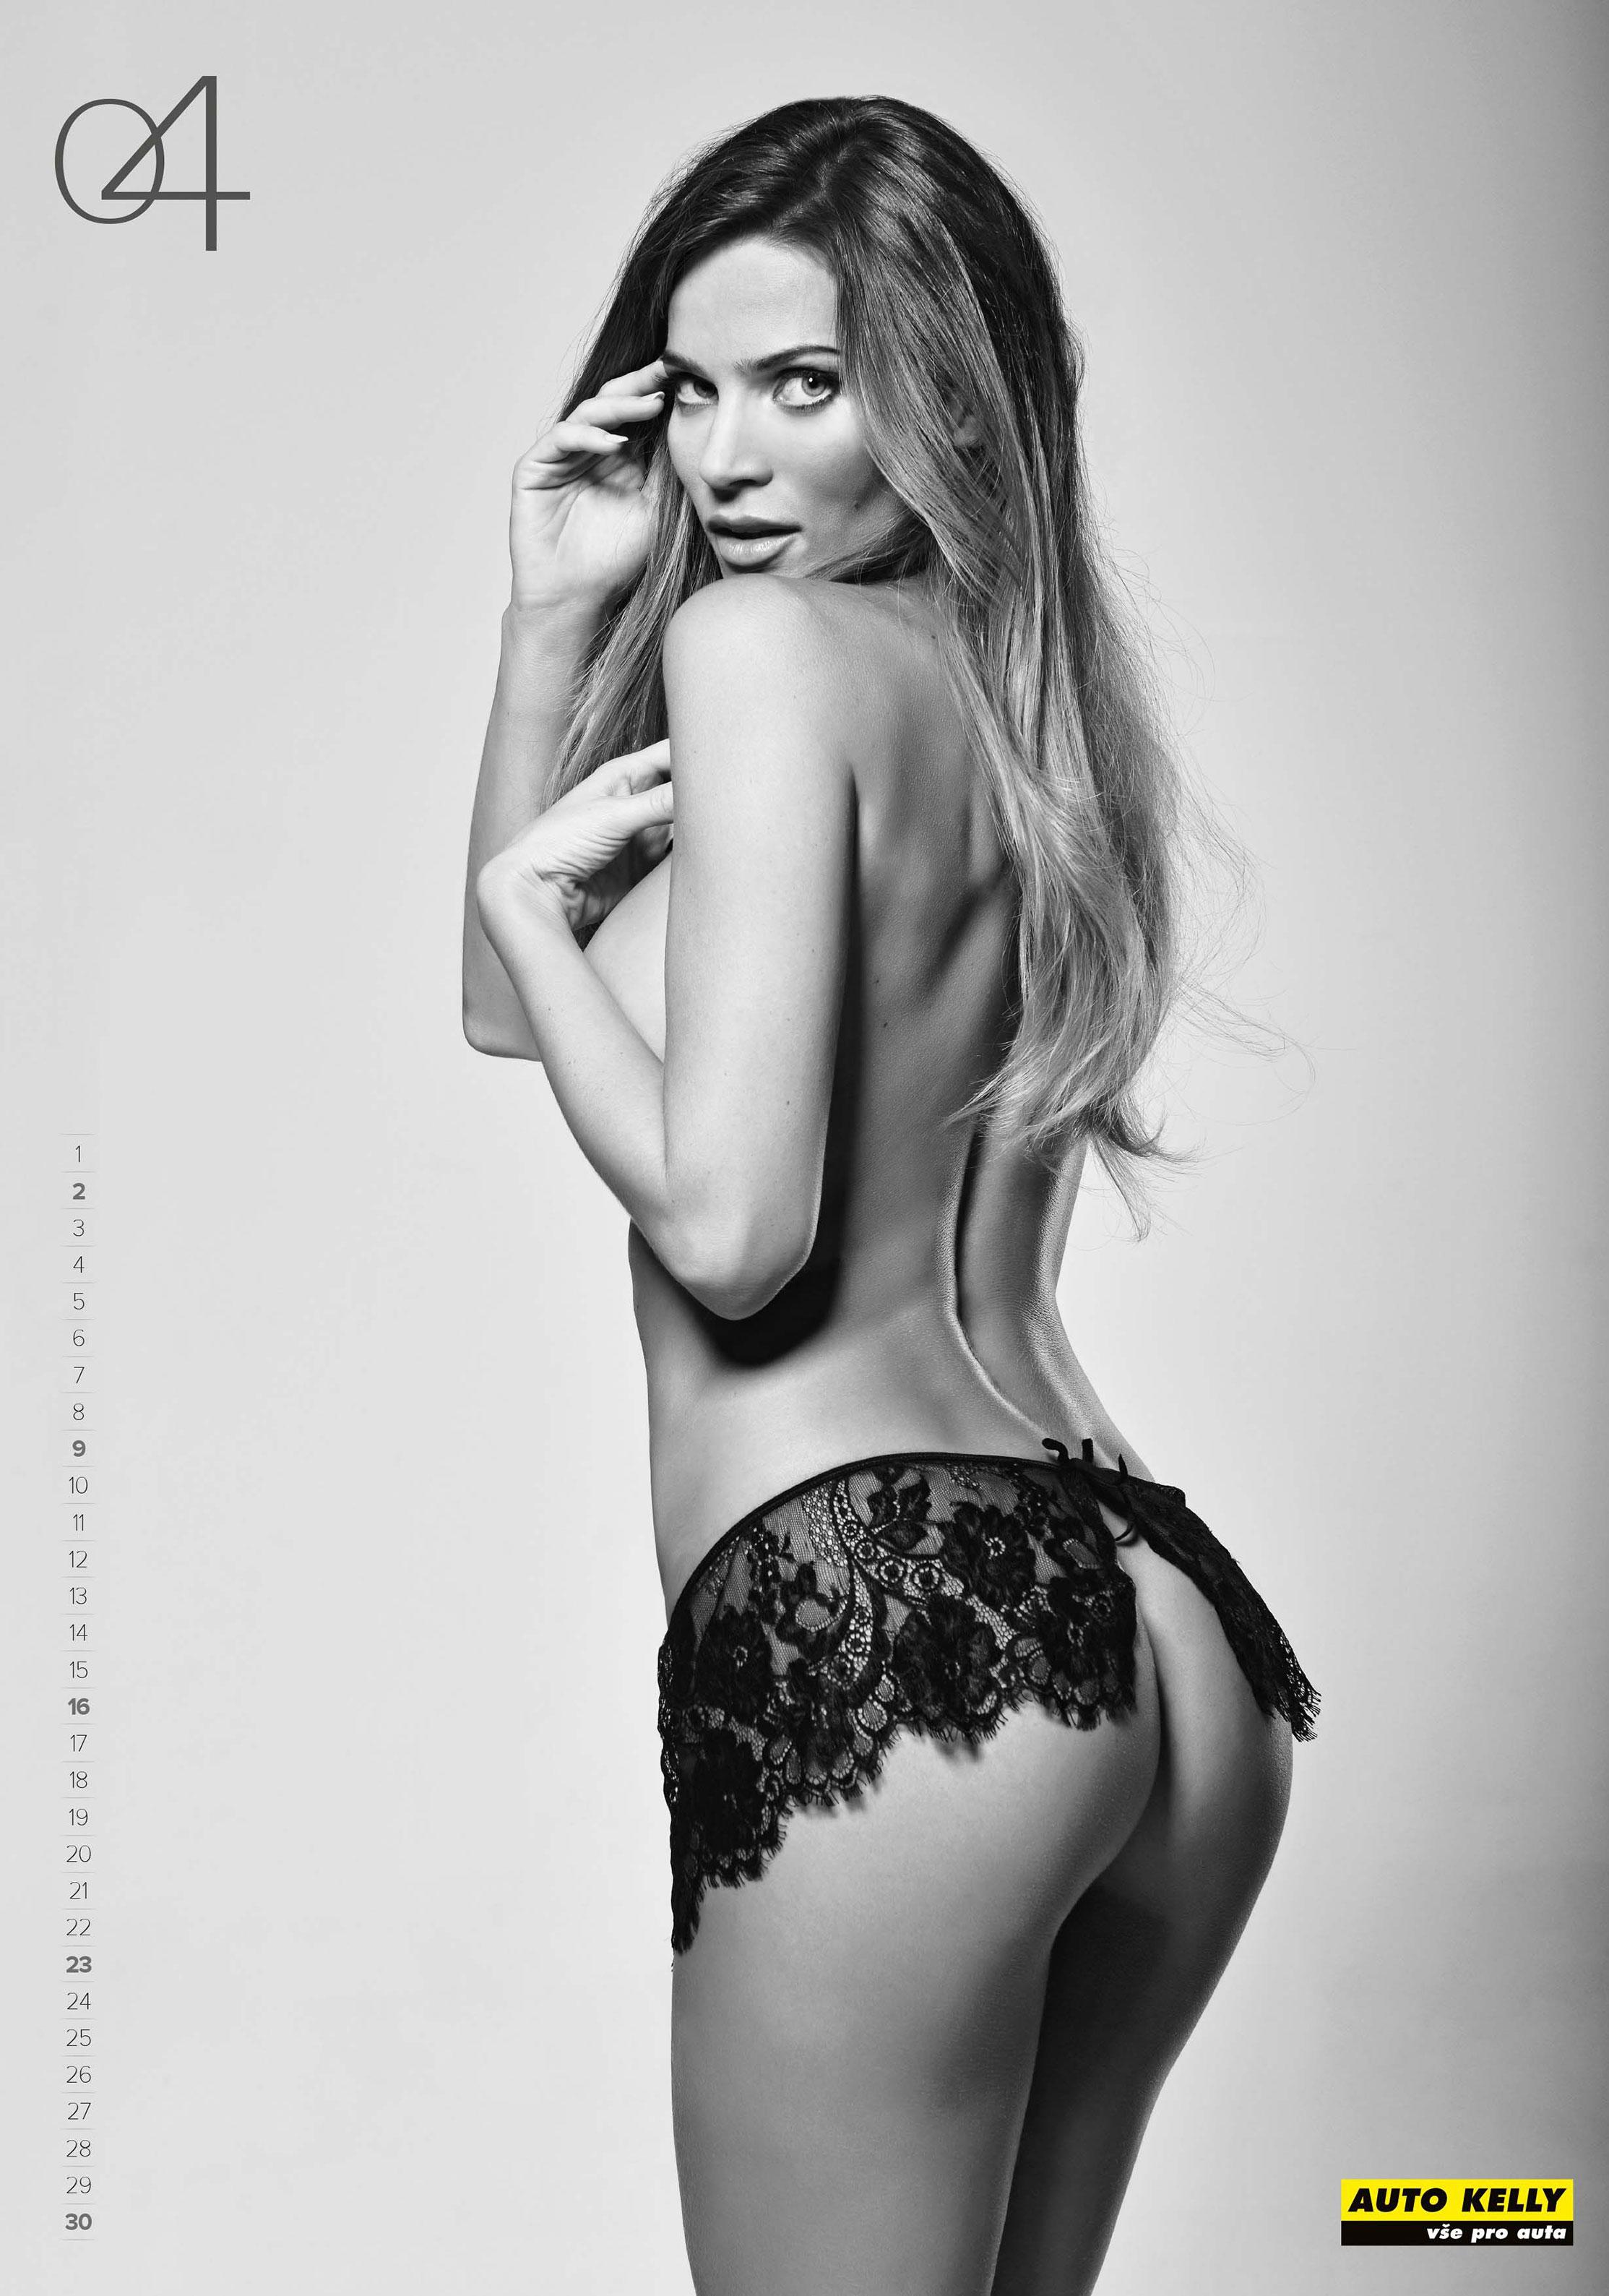 Мисс Словакия Андреа Вересова / Andrea Veresova - Auto Kelly 2017 calendar